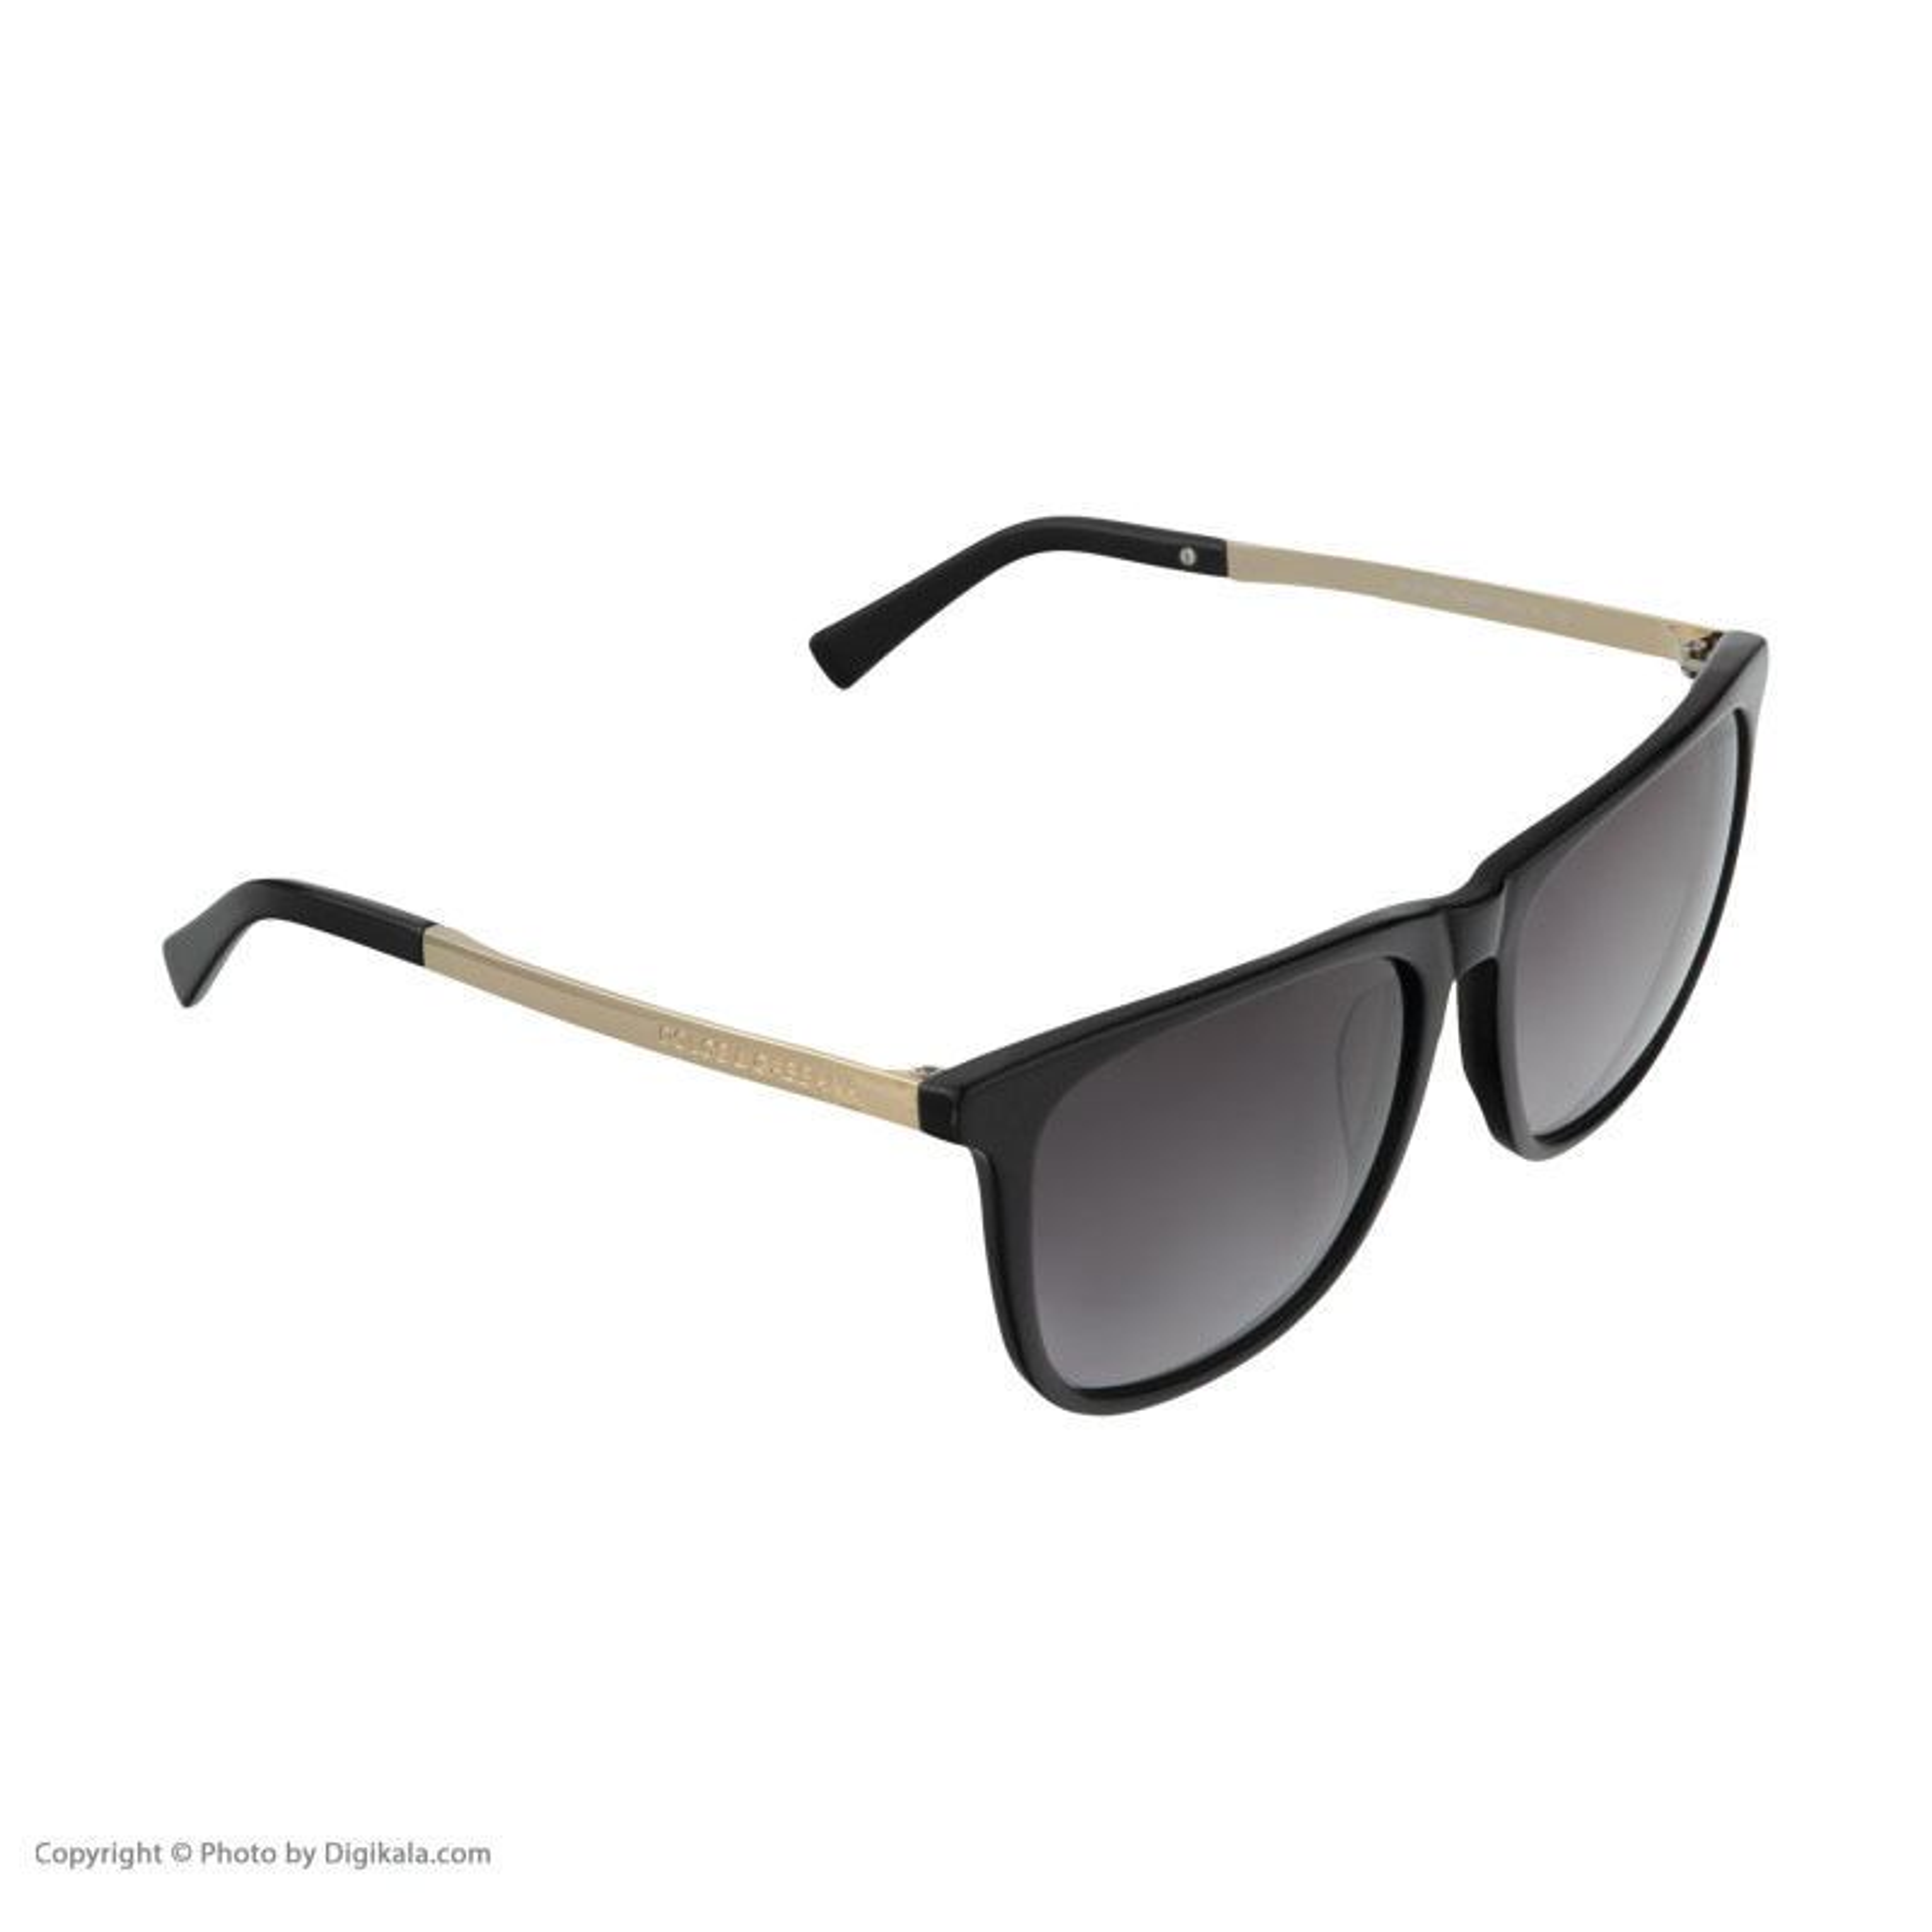 عینک آفتابی دولچه اند گابانا مدل 6106